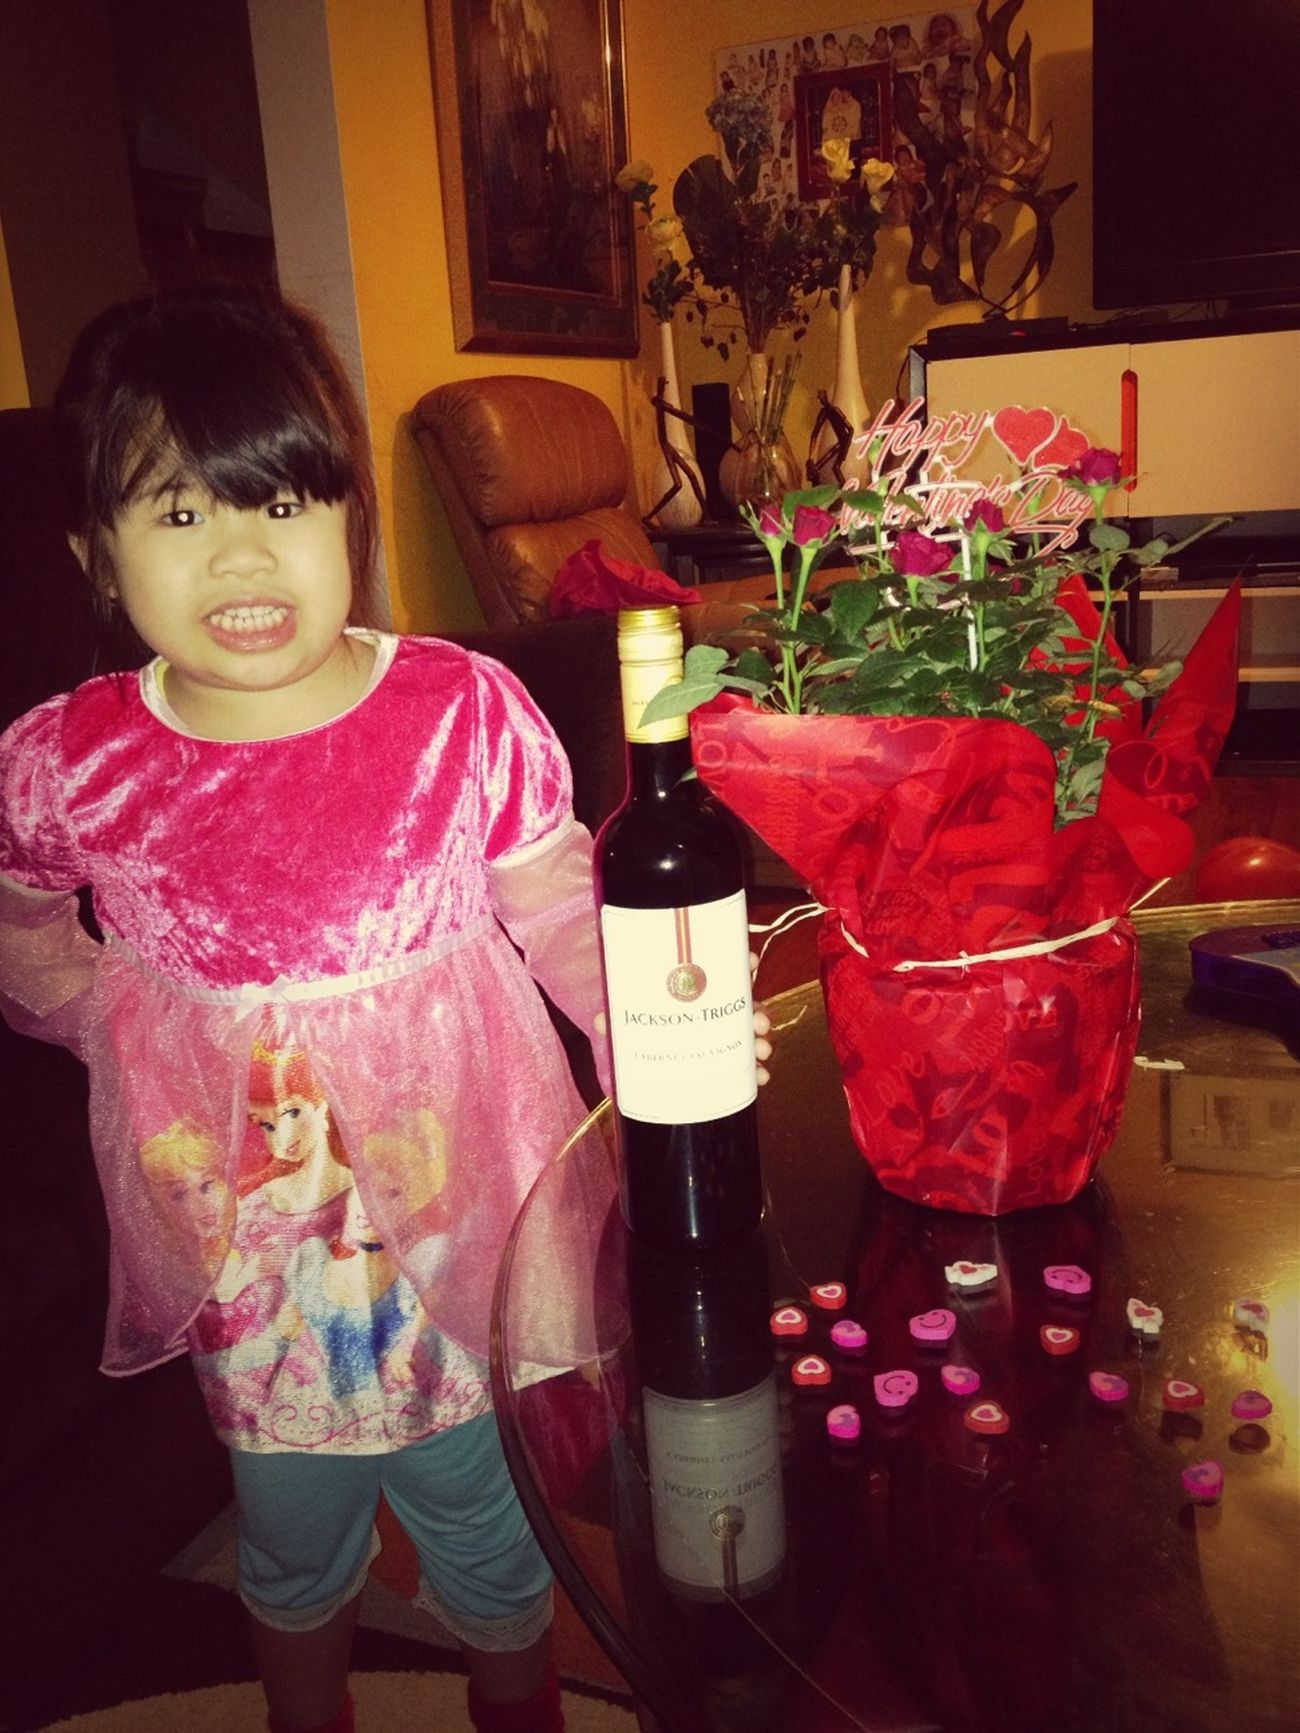 happy valentines everybody!!